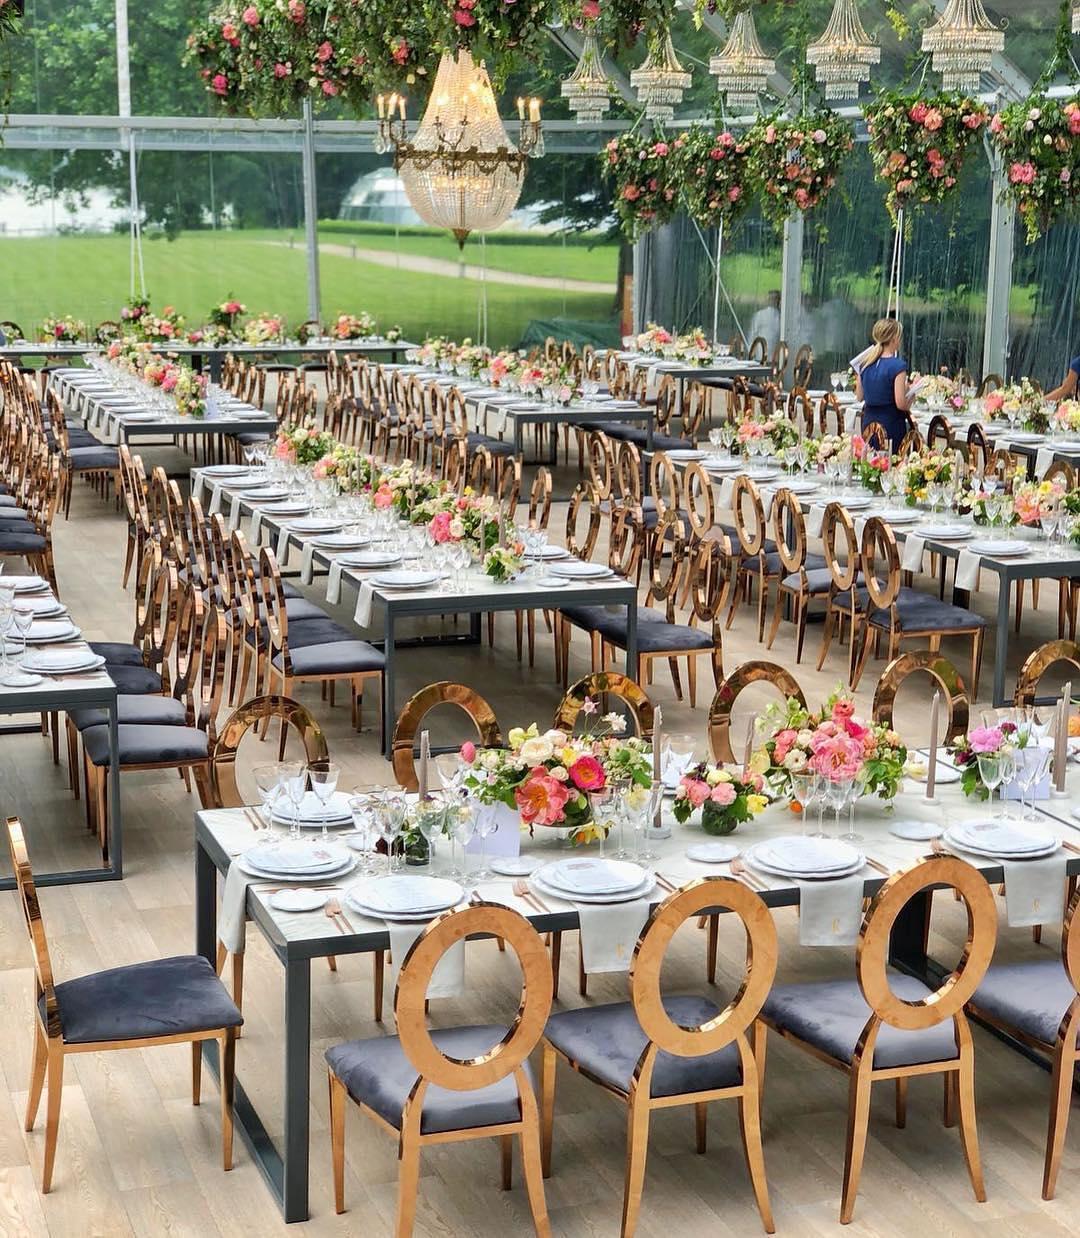 wedding decor, floral decor, deepveer wedding decor, deepveer wedding, lake como, Italy